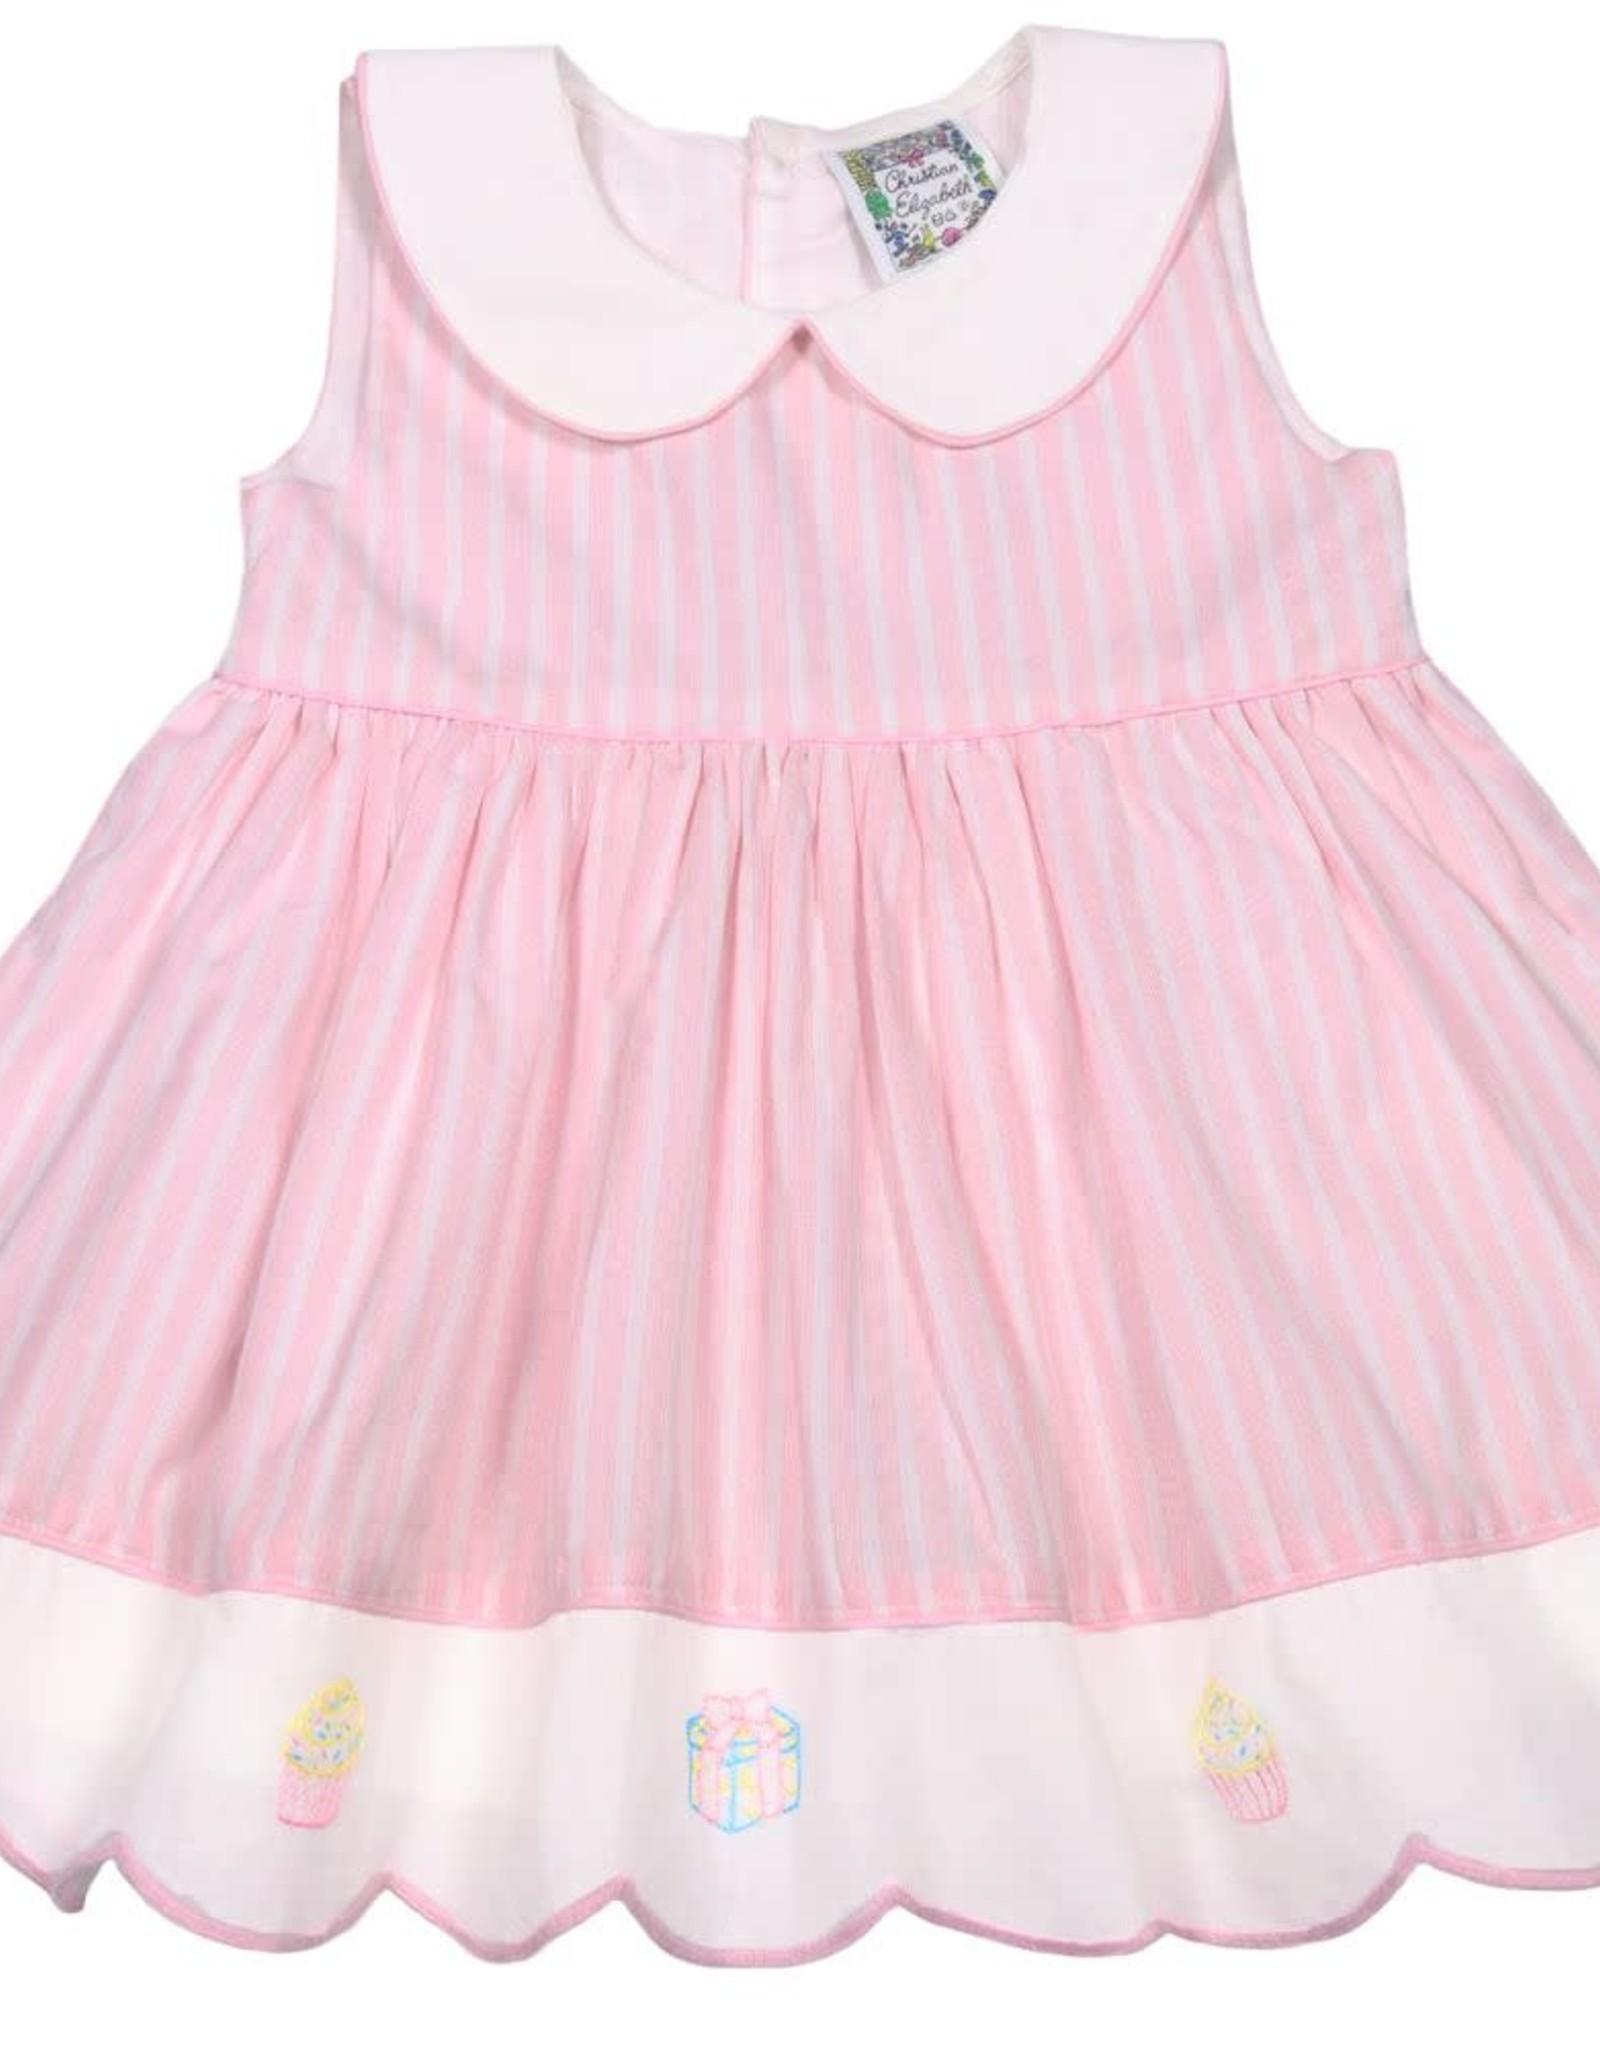 Christian Elizabeth Pink Charlestown Celebration Dress